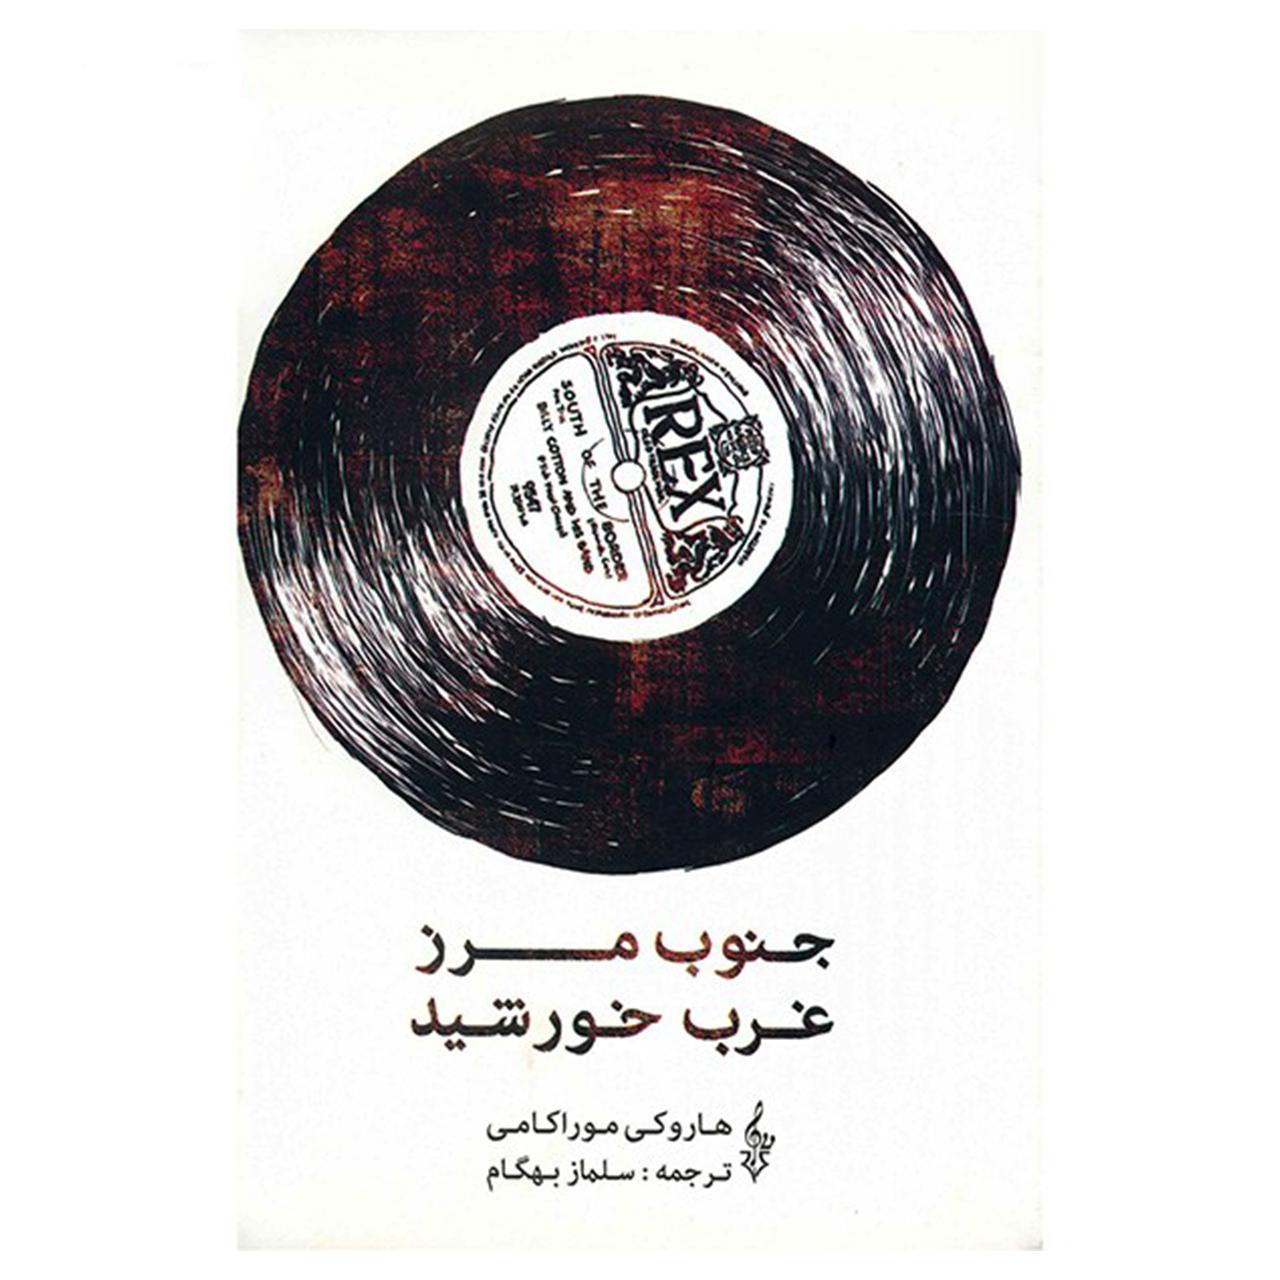 کتاب جنوب مرز غرب خورشید اثر هاروکی موراکامی نشر ترانه